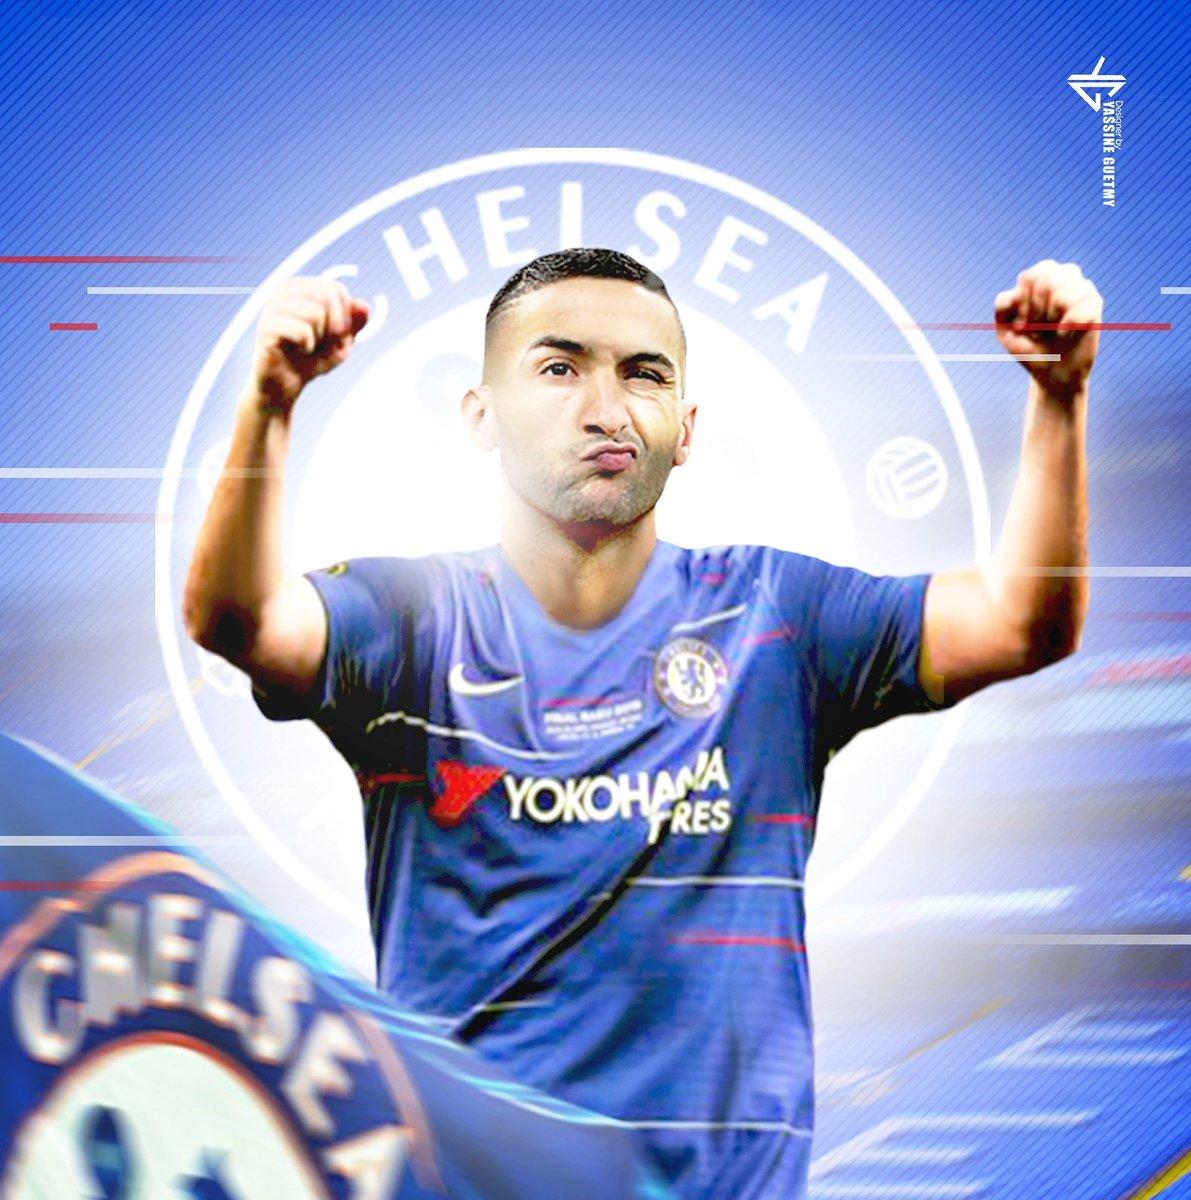 Hakim Ziyech avec le nouveau maillot de club @ChelseaFC #footballgame #footballseason #footballgames #footballplayer  #catch #quarterback #nfl #superbowl #kickoff #run @433 @Sporf #Chelsea #football  #hakimziyech #dimamaghreb #endm  ___________ ART WORK BY @yassineguetmypic.twitter.com/XUEVcN2uWi